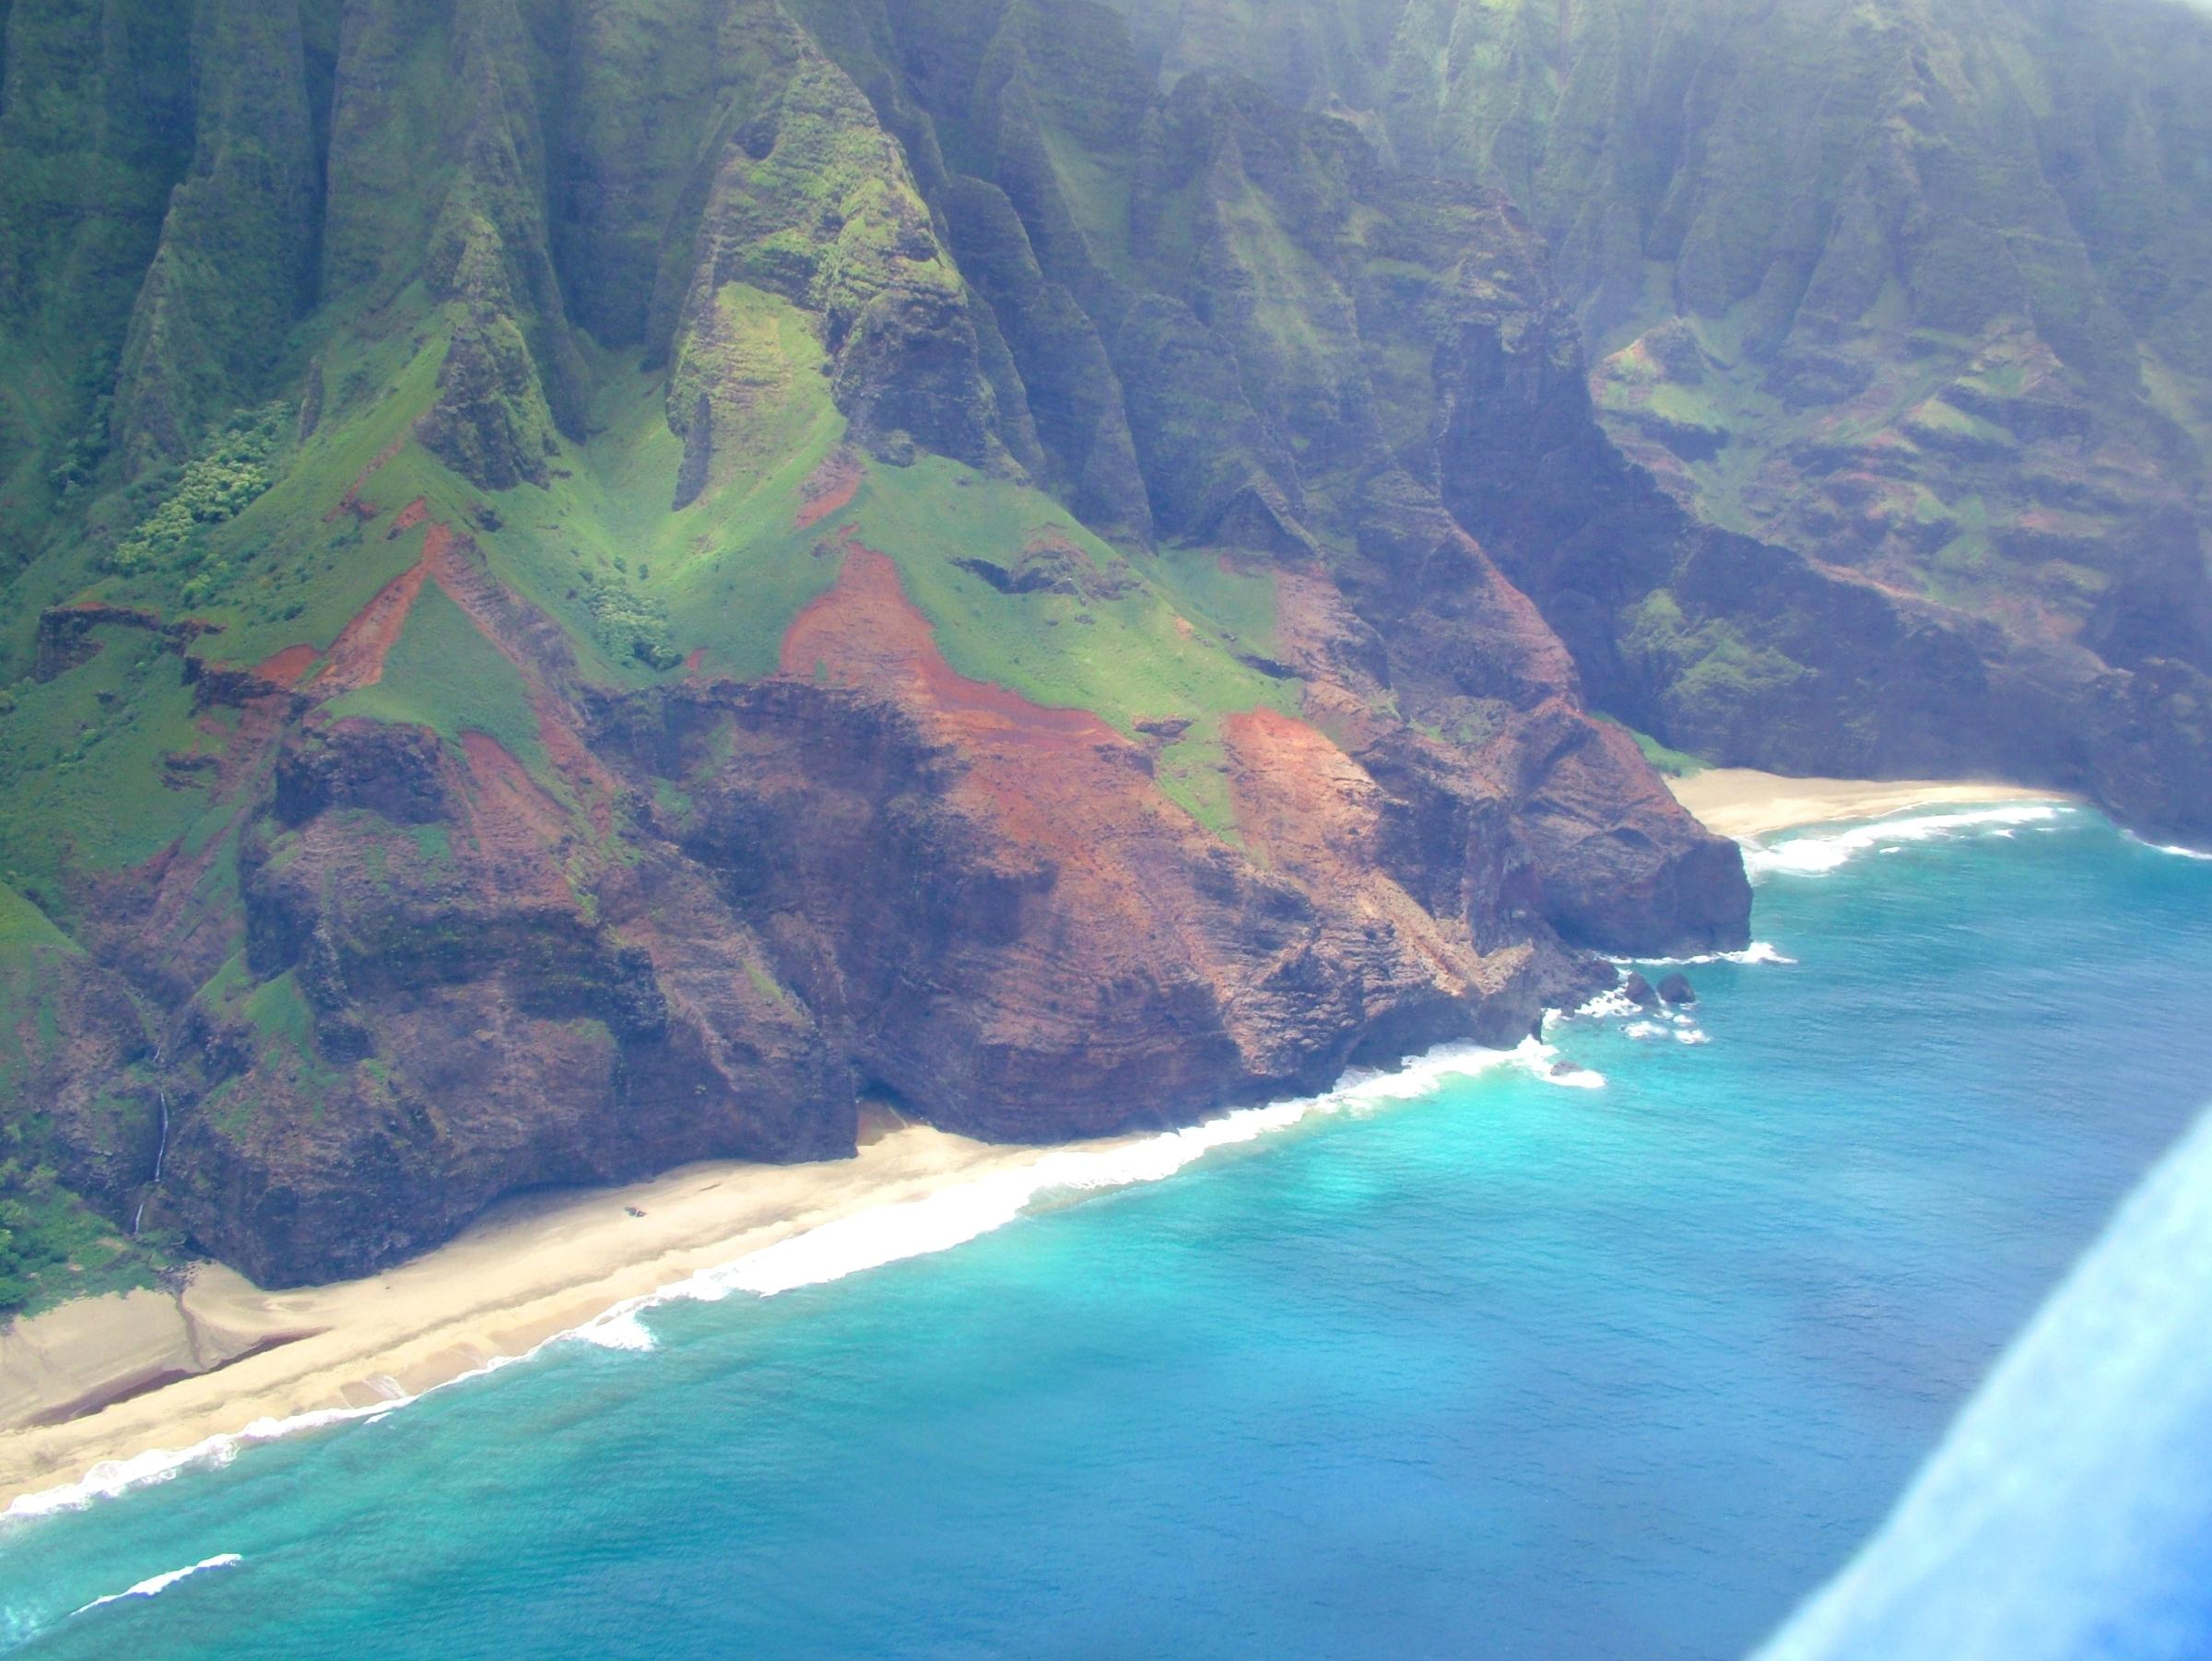 Kauai Helicopter Rides  Kauai Helicopter Flights  Kauai Helicopter Tours